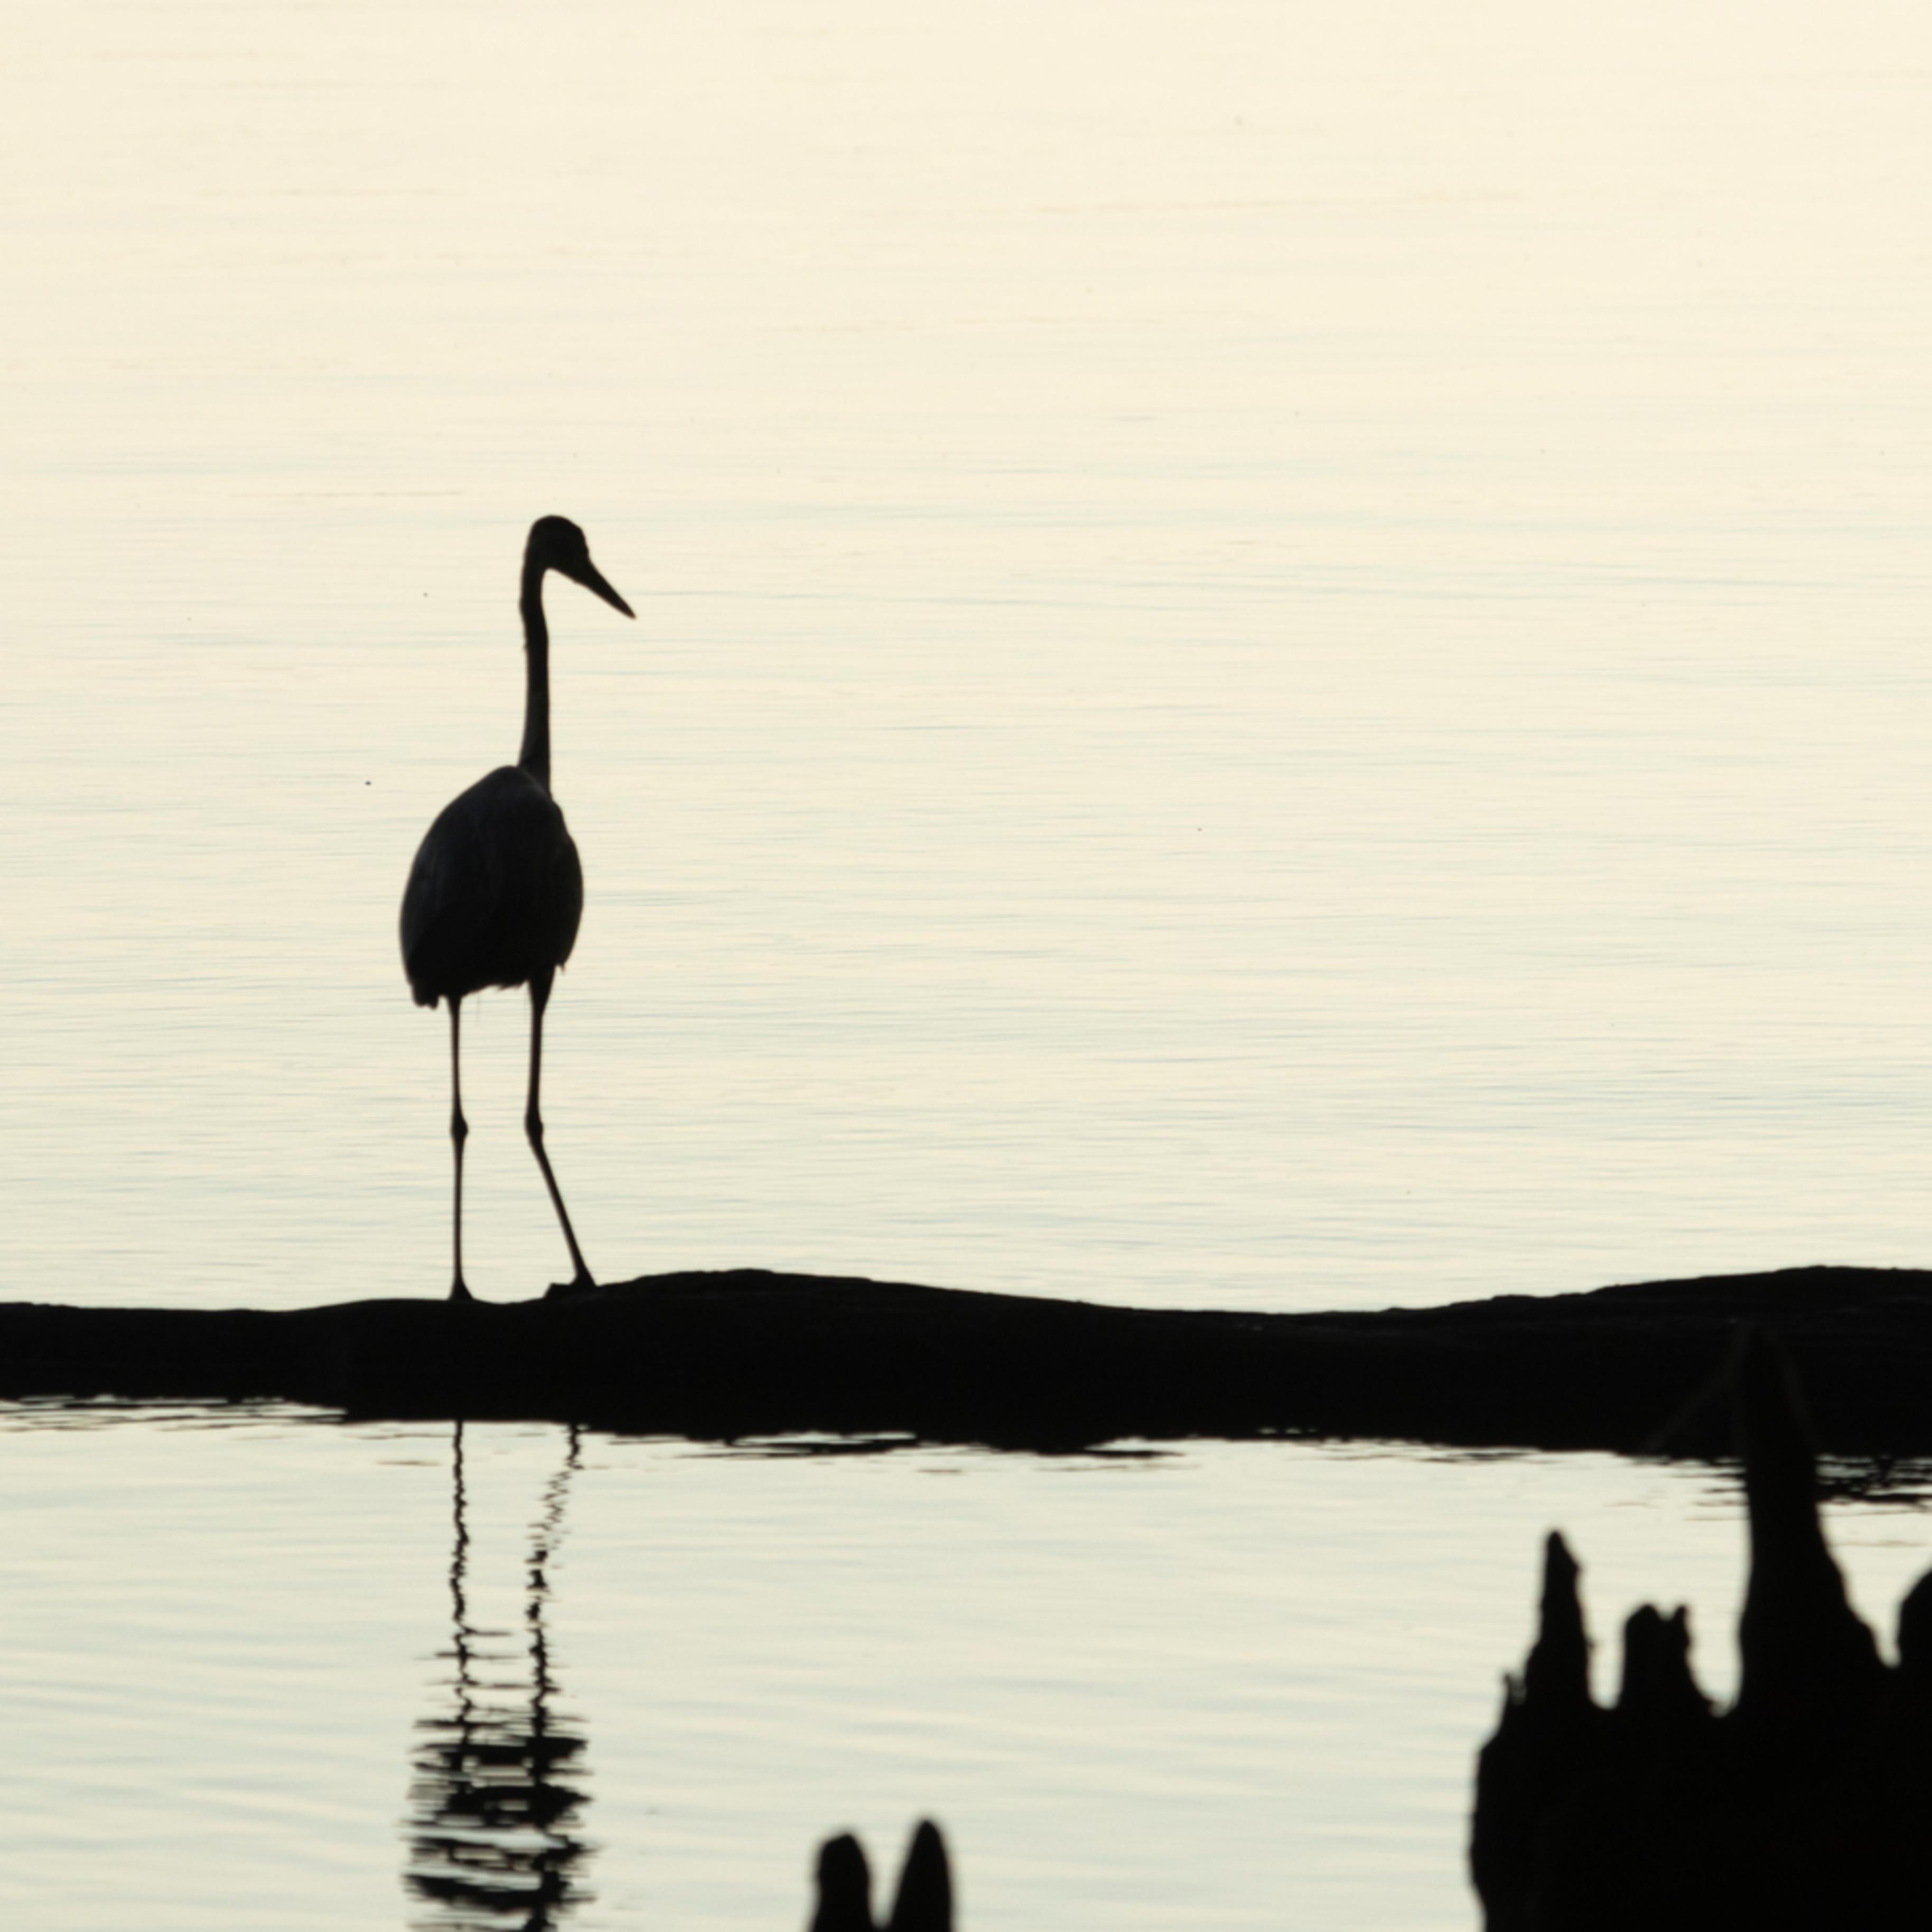 Heron silhouettes mg 7521 srm20 voilqf